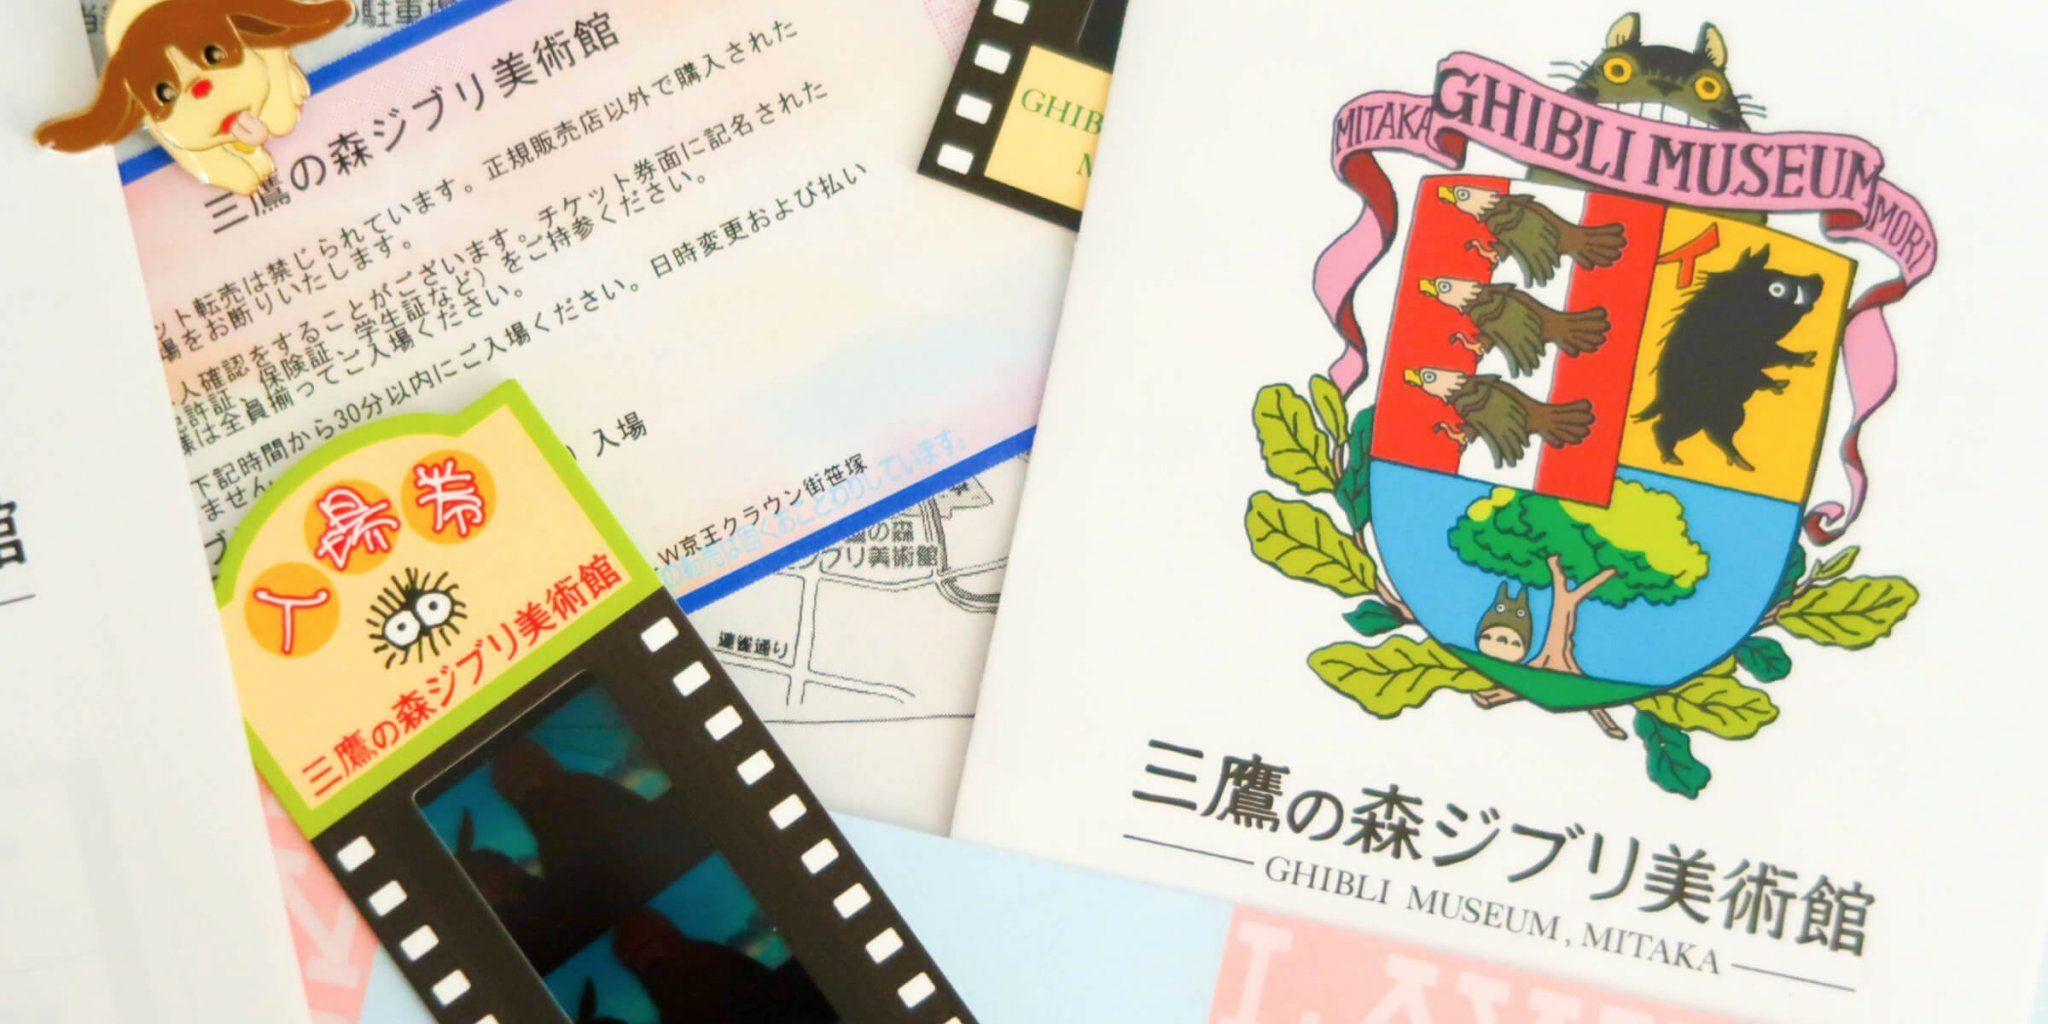 5 Ways To Buy Ghibli Museum Tickets Museum Tickets Ghibli Tokyo Museum